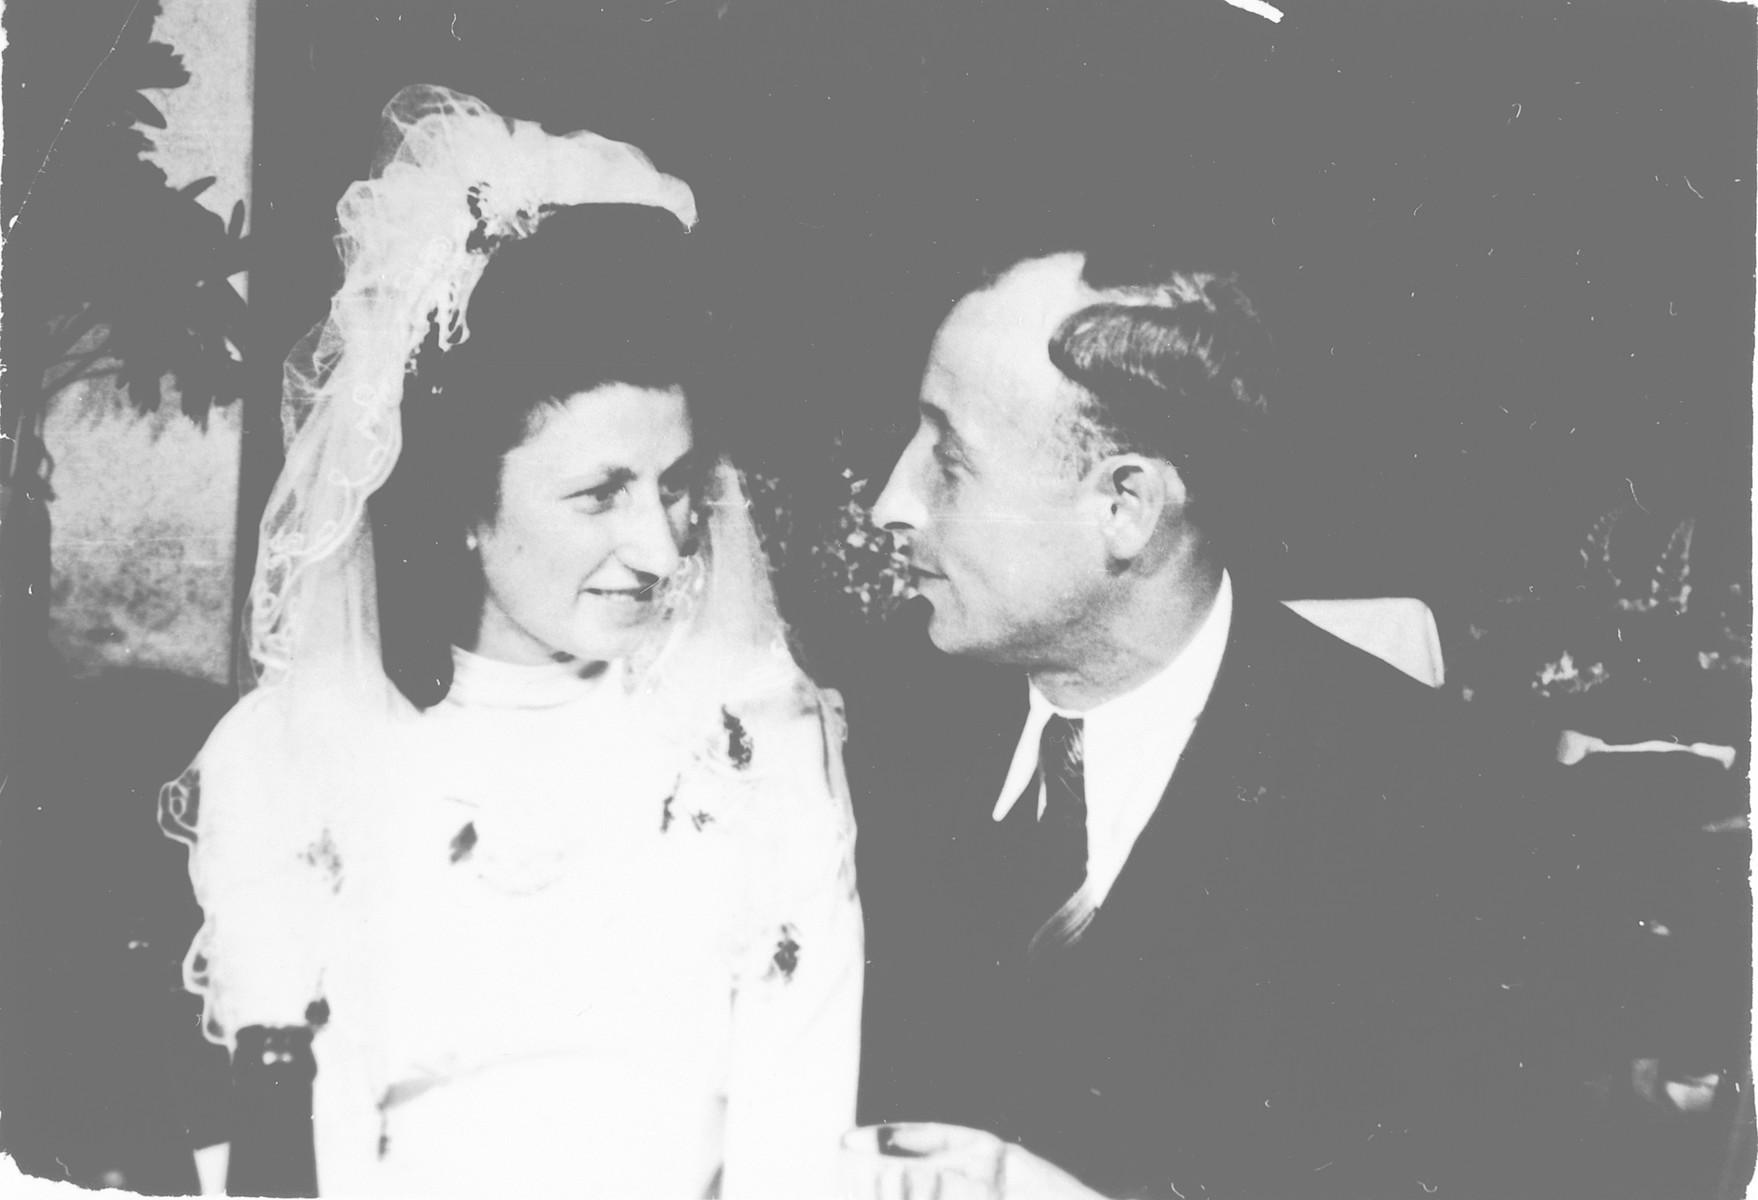 Wedding portrait of Max and Sala Grinblatt (maiden name, Kuperberg).